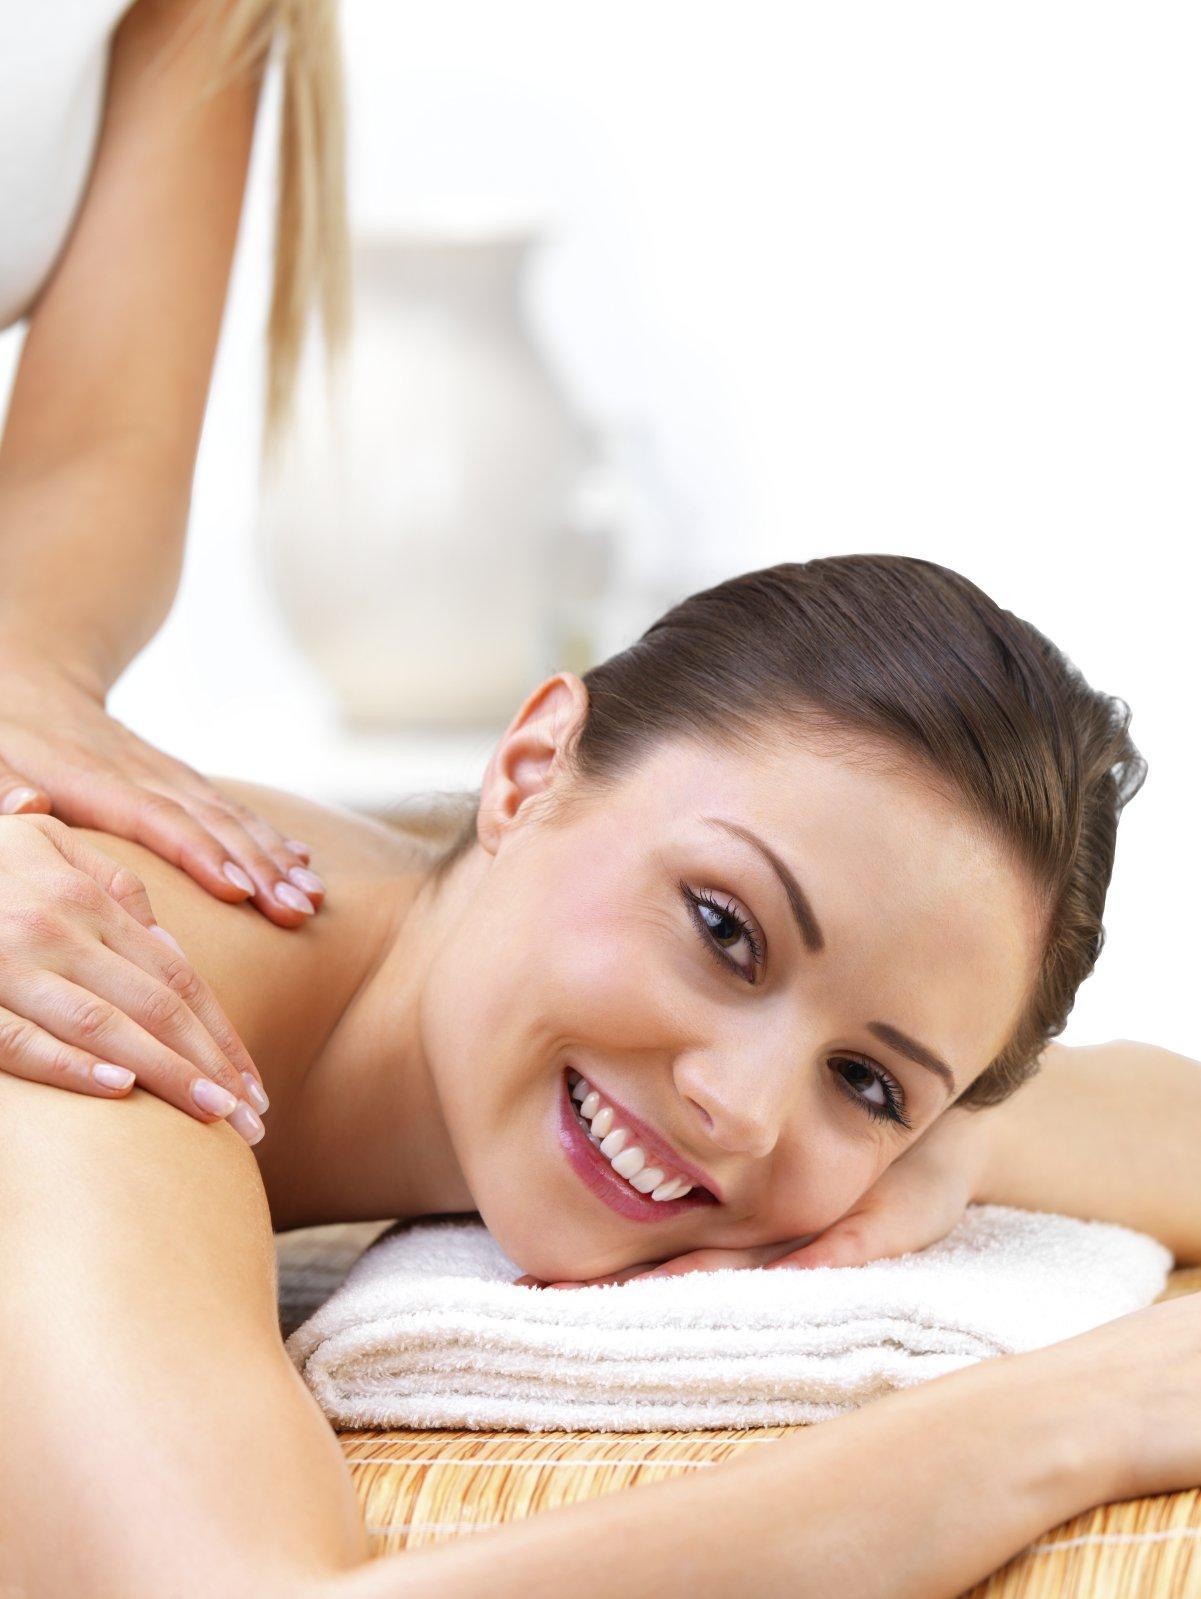 Body treatments at Enhance Woodstock